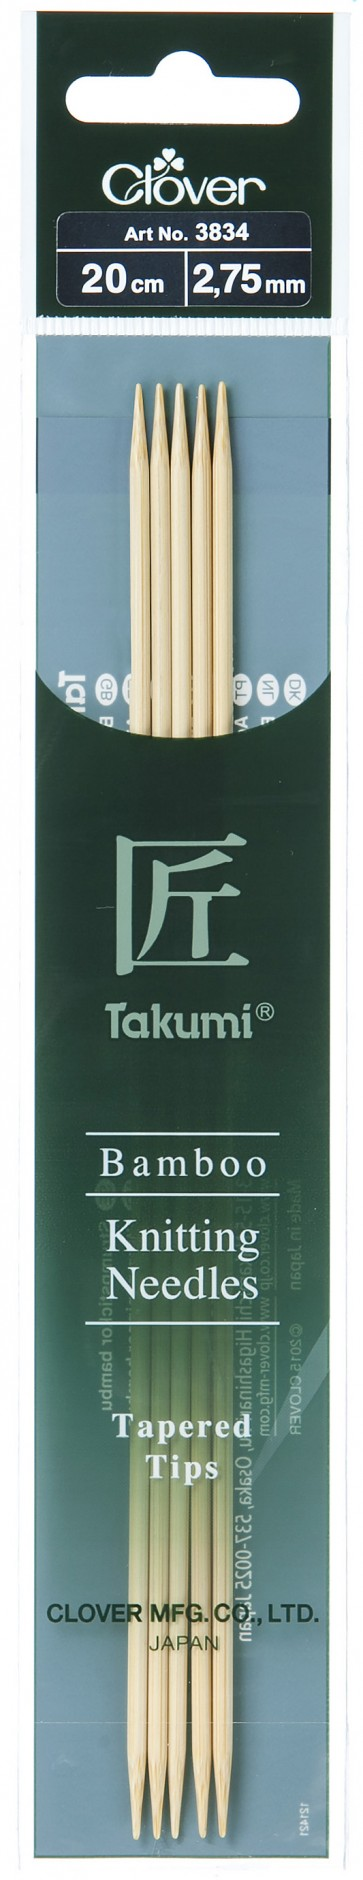 CLOVER Strumpfstrickndl Bambus Takumi 20cm/2.75mm